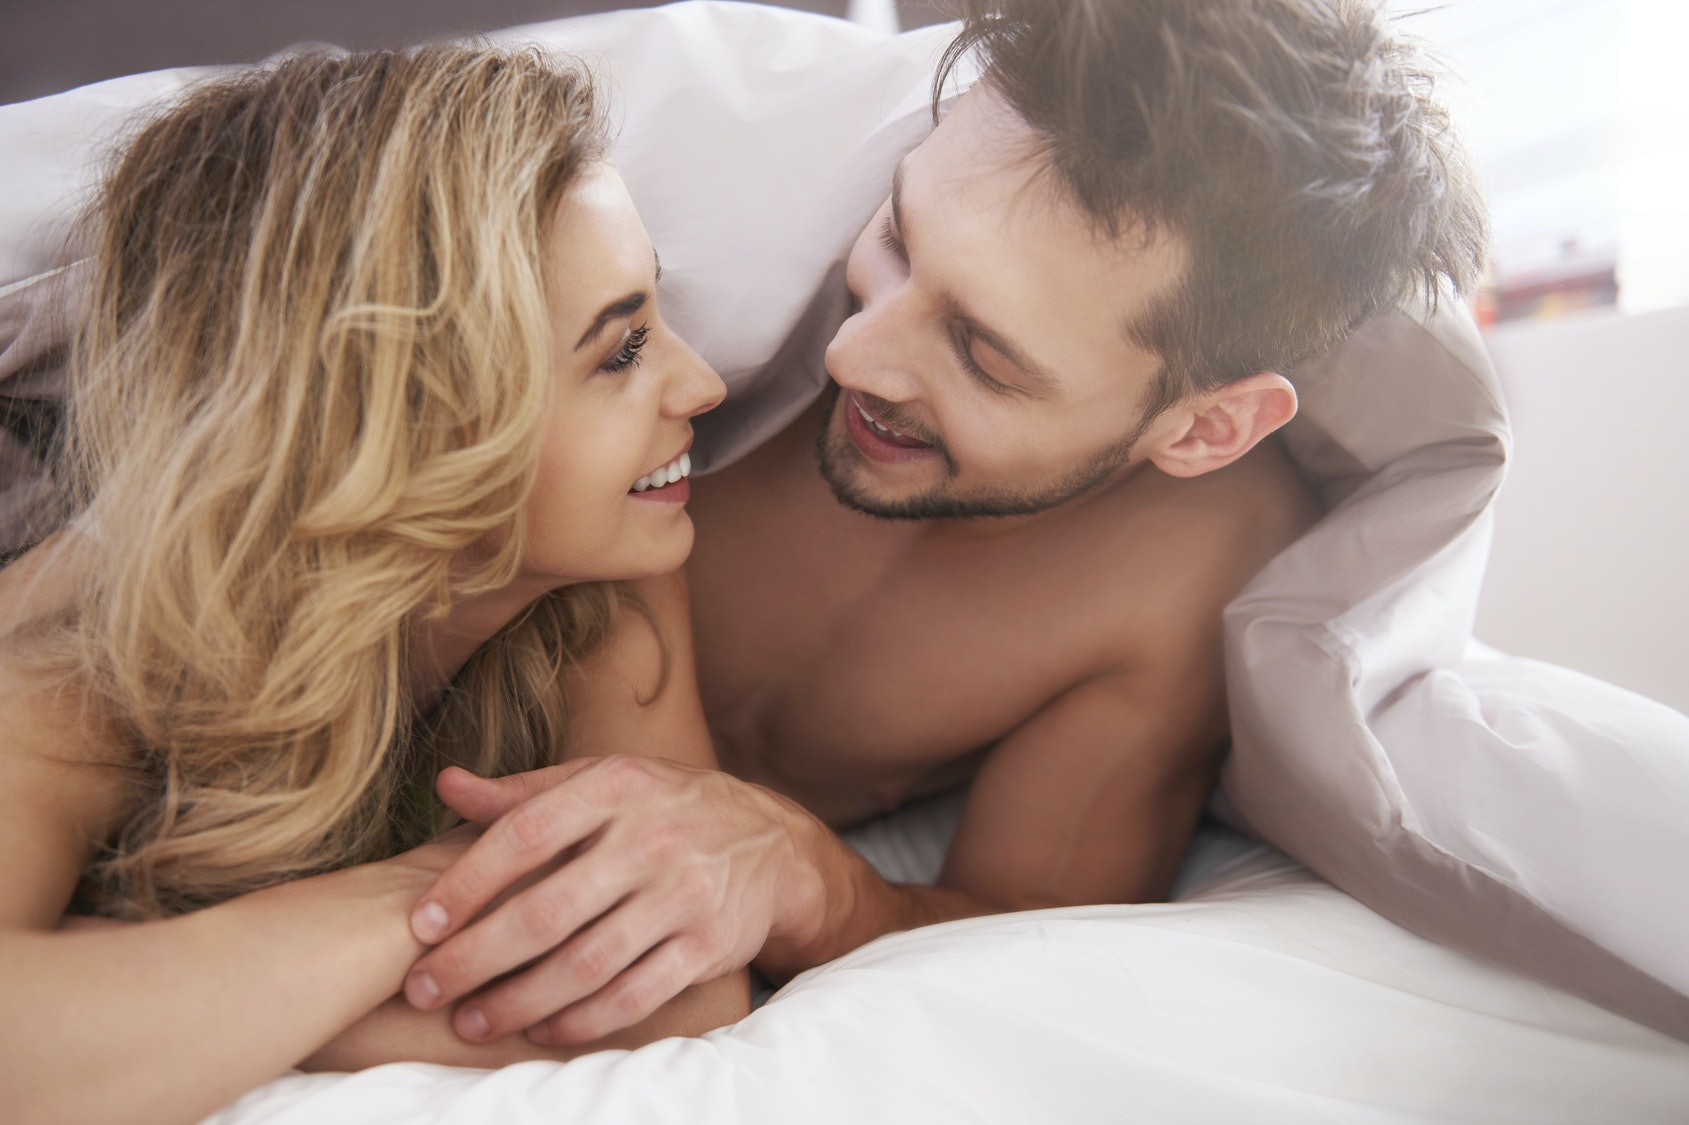 Sexy amature orgasm vid